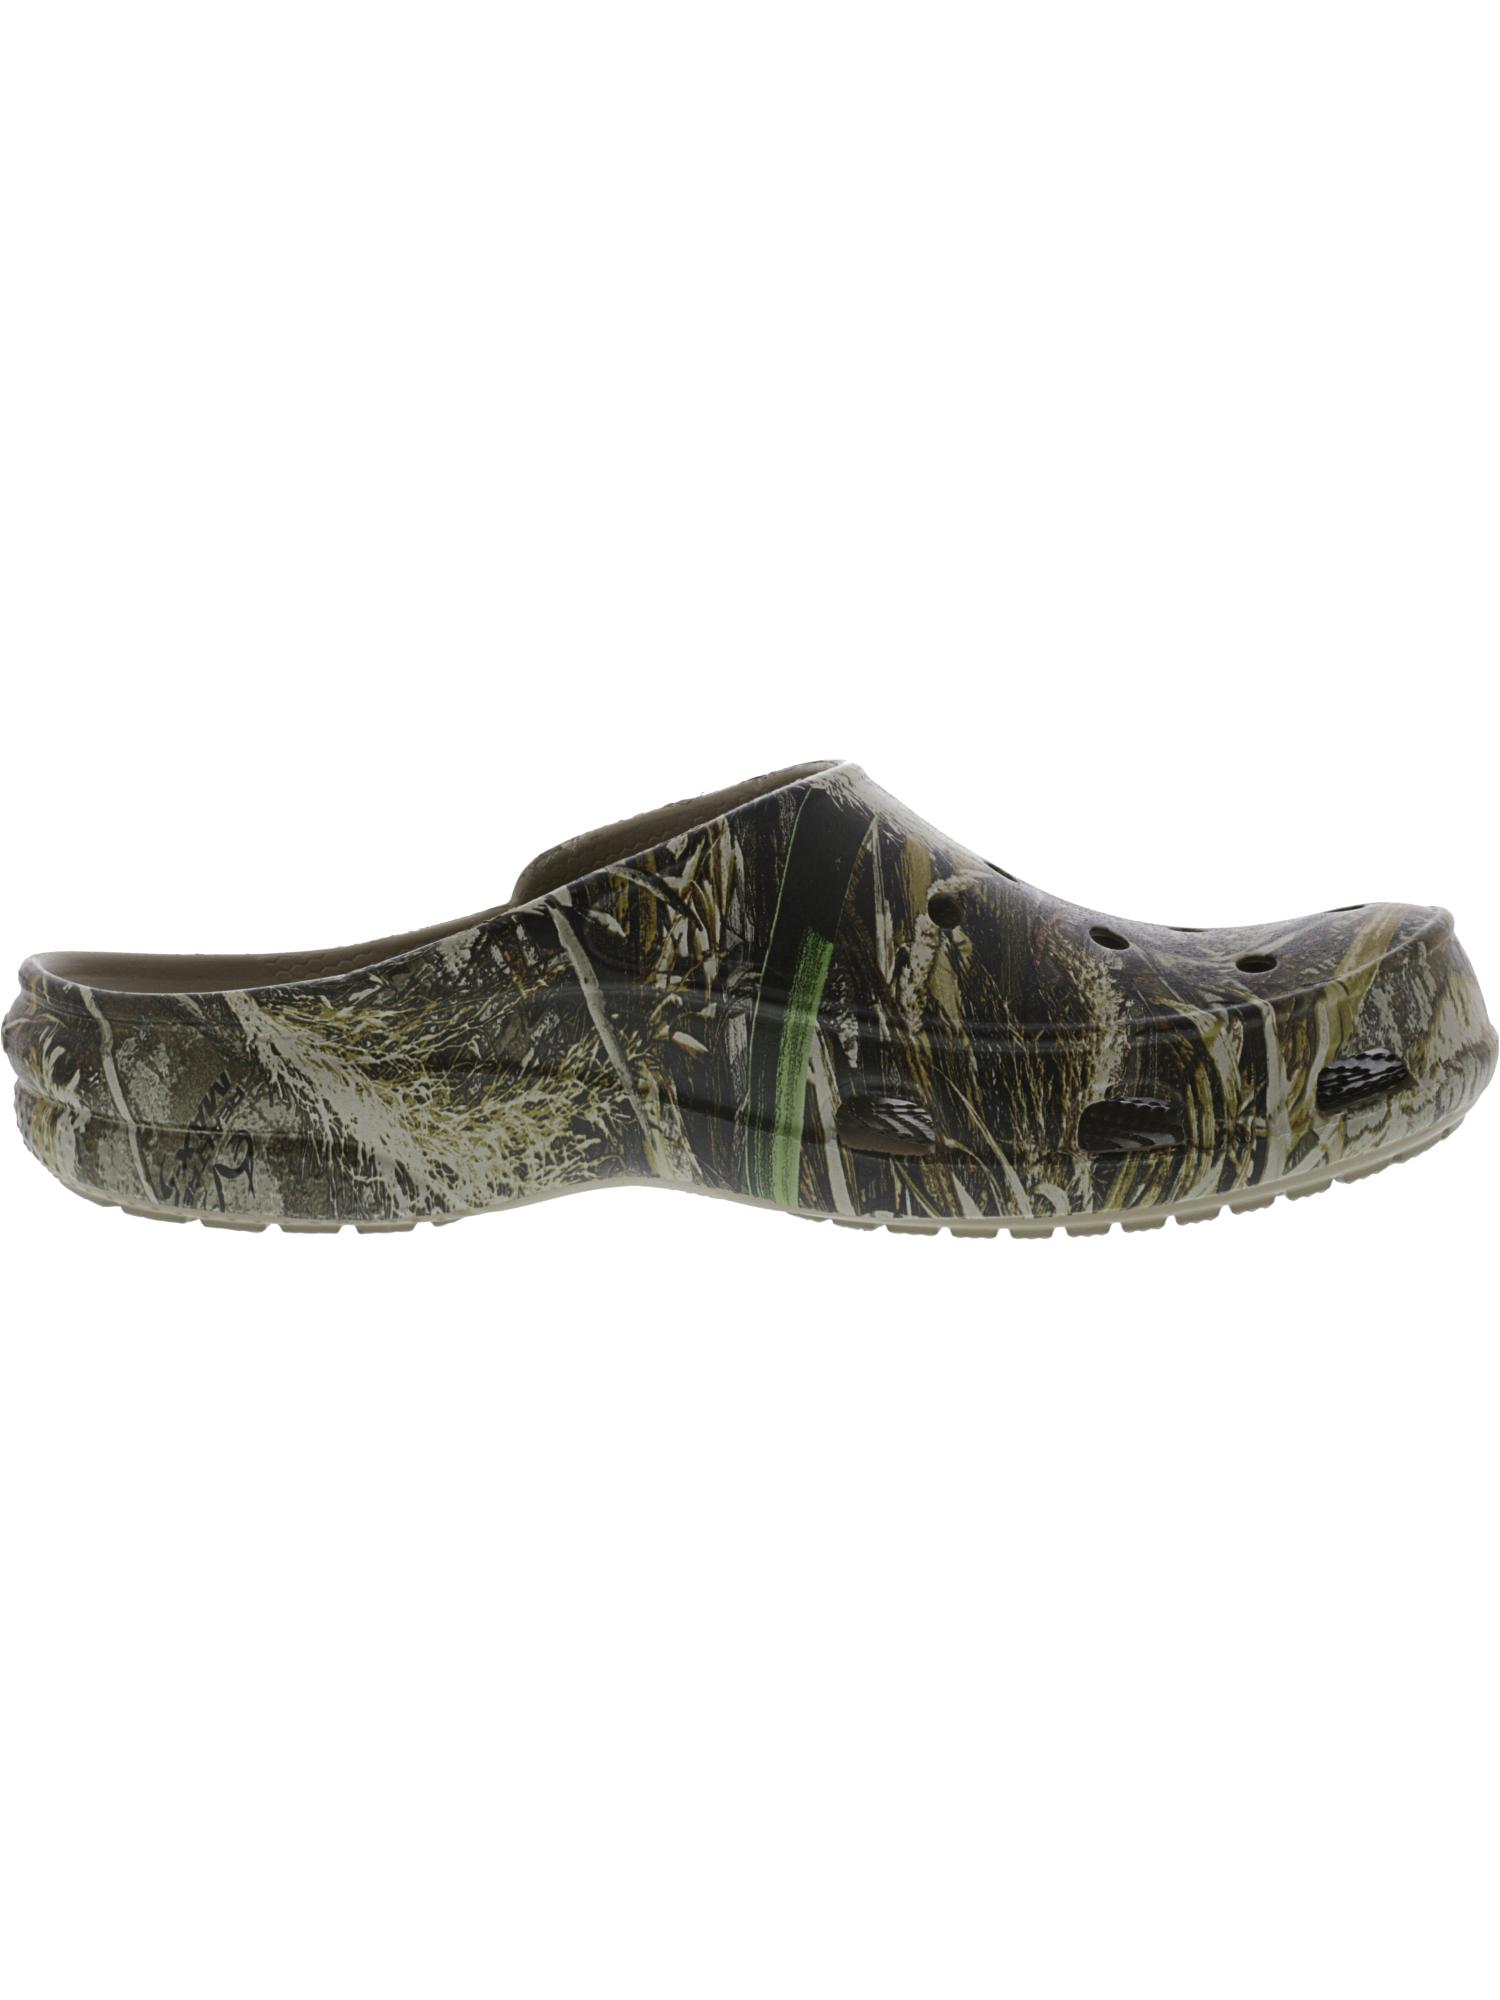 Crocs-Women-039-s-Freesail-Realtree-Max-5-Clogs thumbnail 5